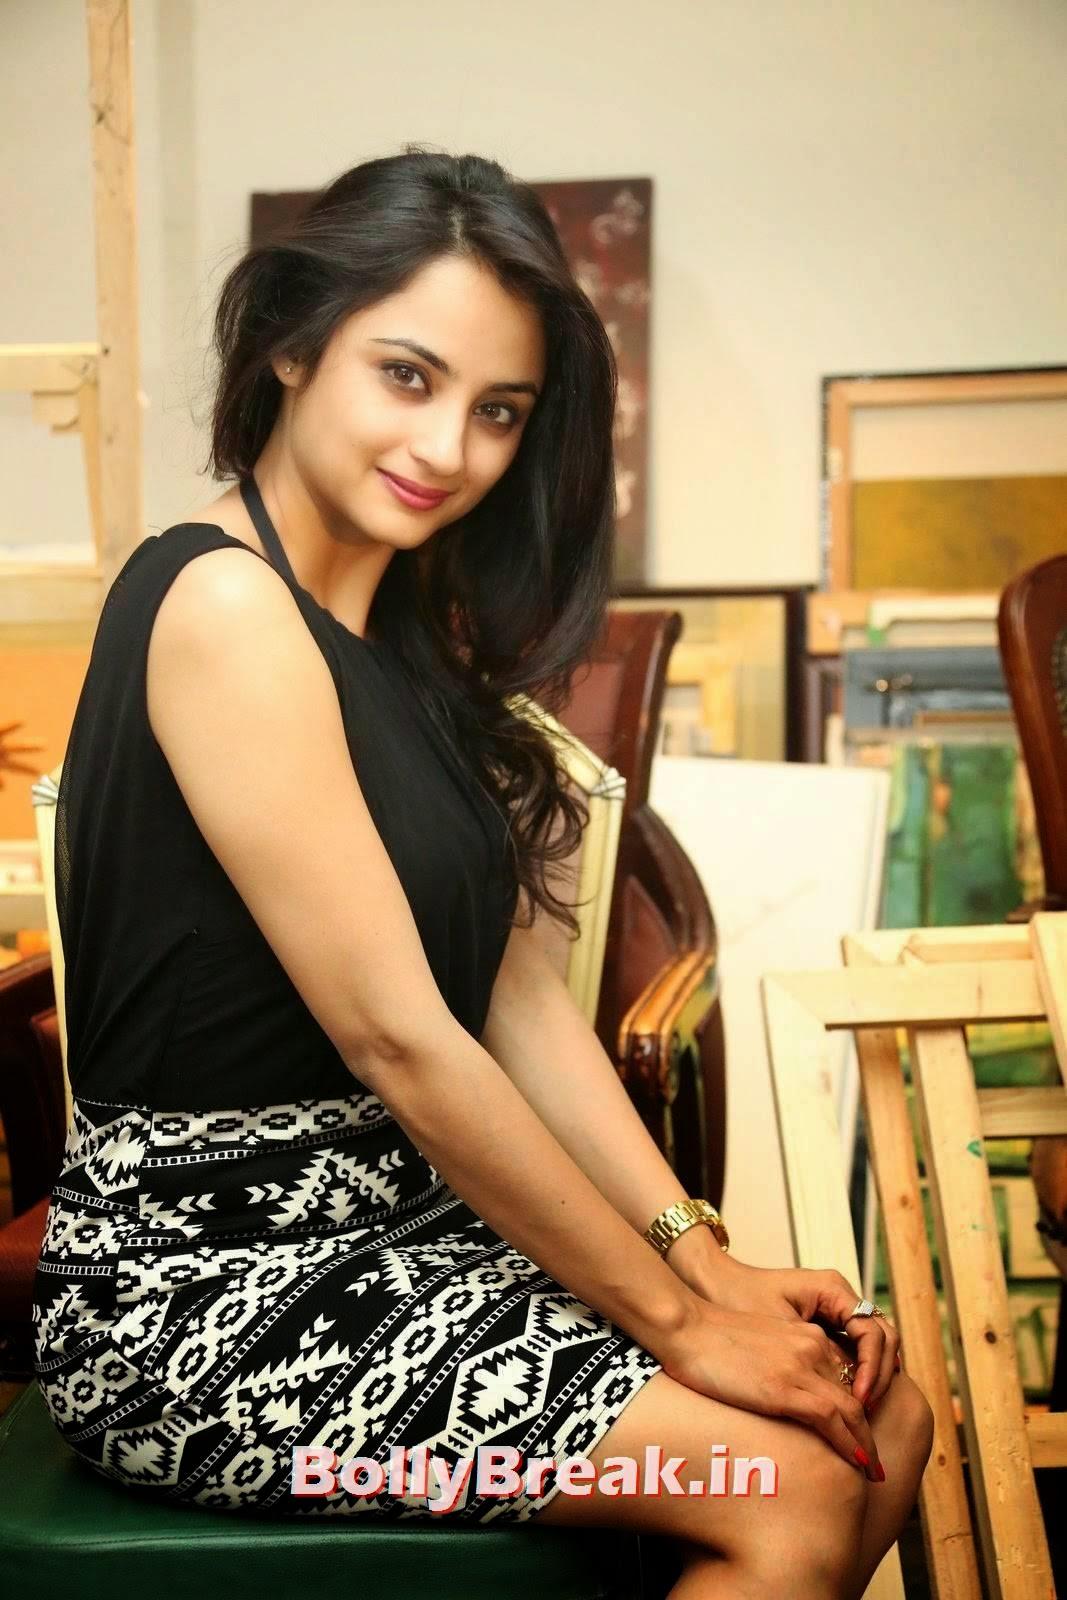 Actress Madirakshi Stills, Actress Madirakshi Hot Pics in Skirt & Black Top